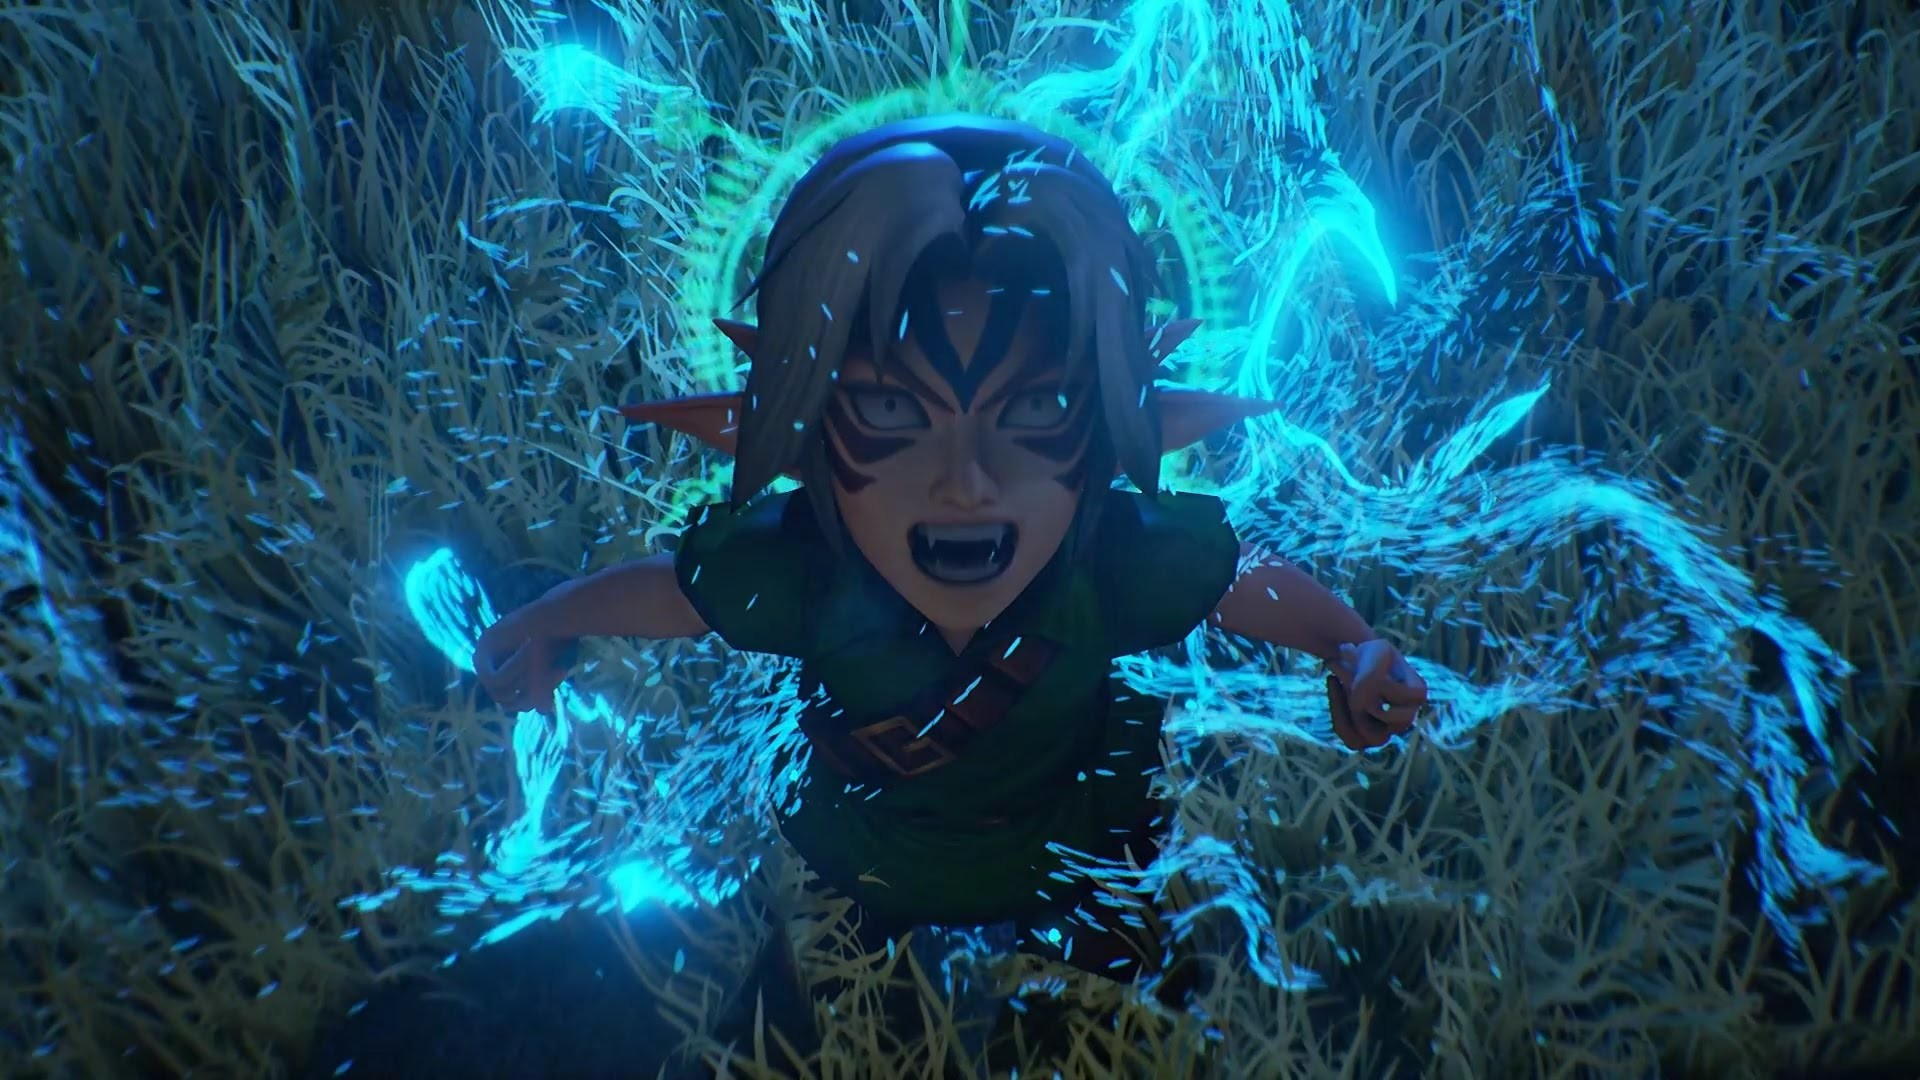 Déjà Vu — The Legend of Zelda: Majora's Mask 3D Review |